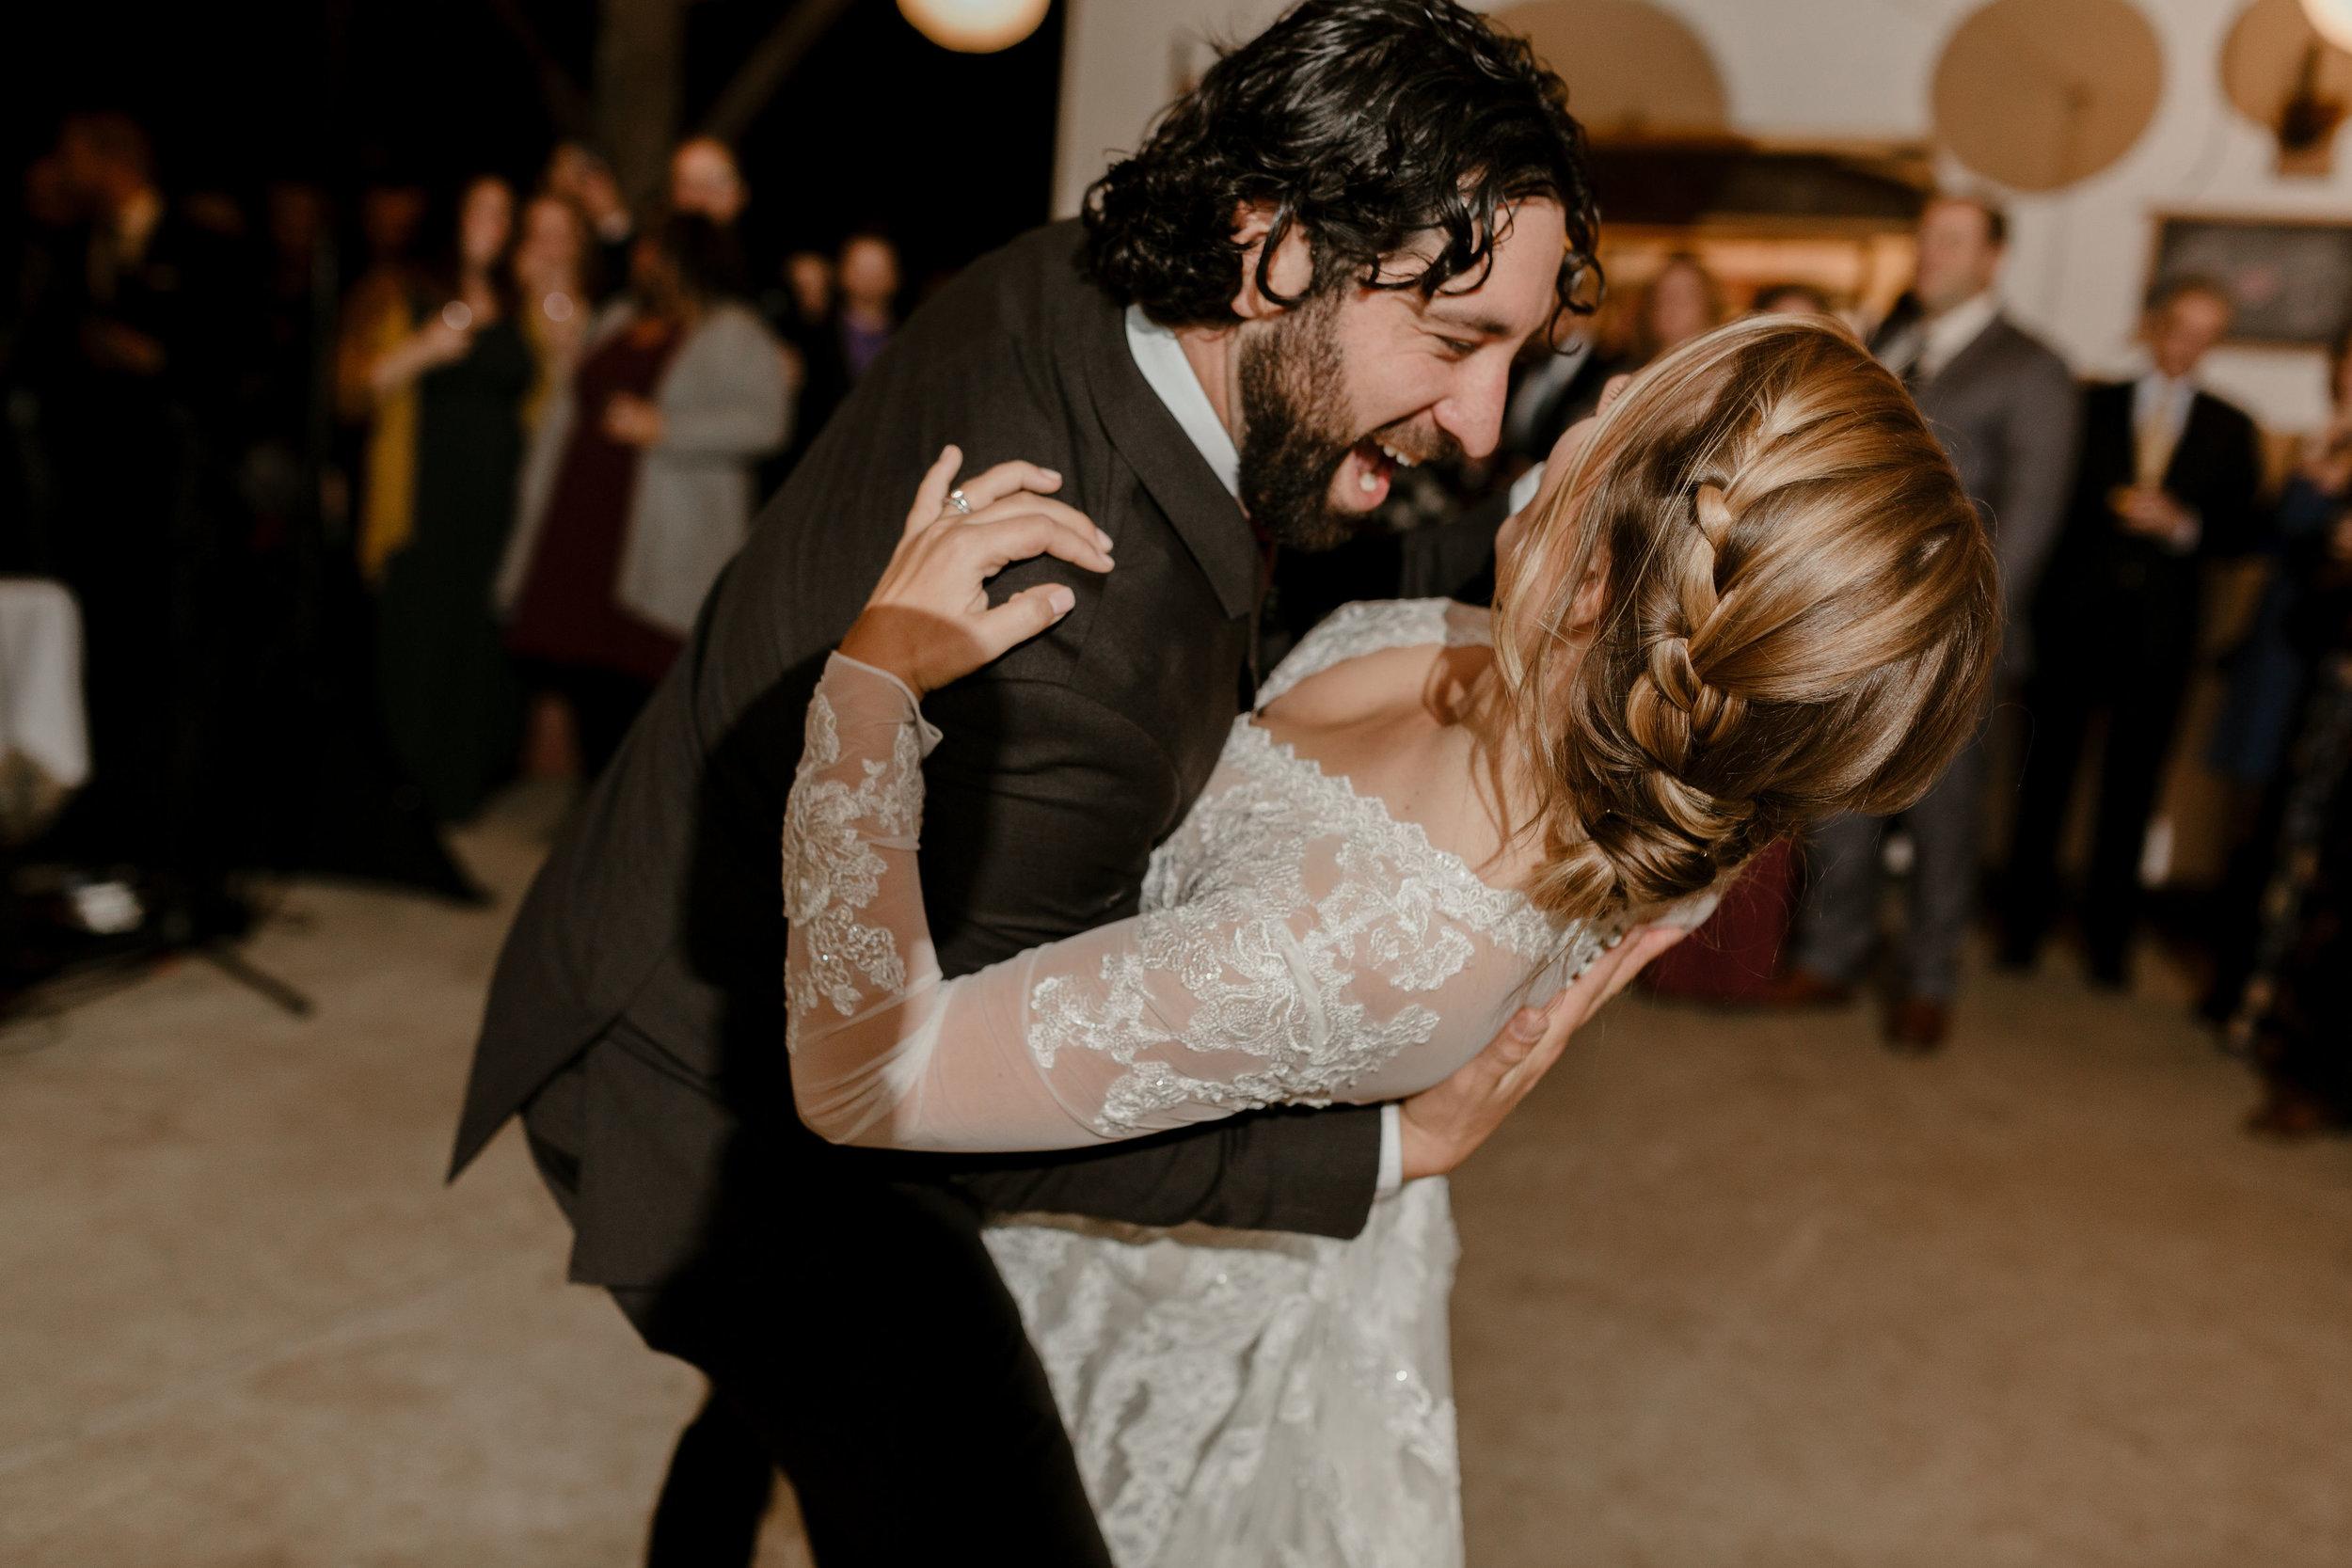 young-love-media-rustic-fall-autumn-wedding-emmerich-tree-farm-hudson-valley-warwick-new-york-reception-140.jpg